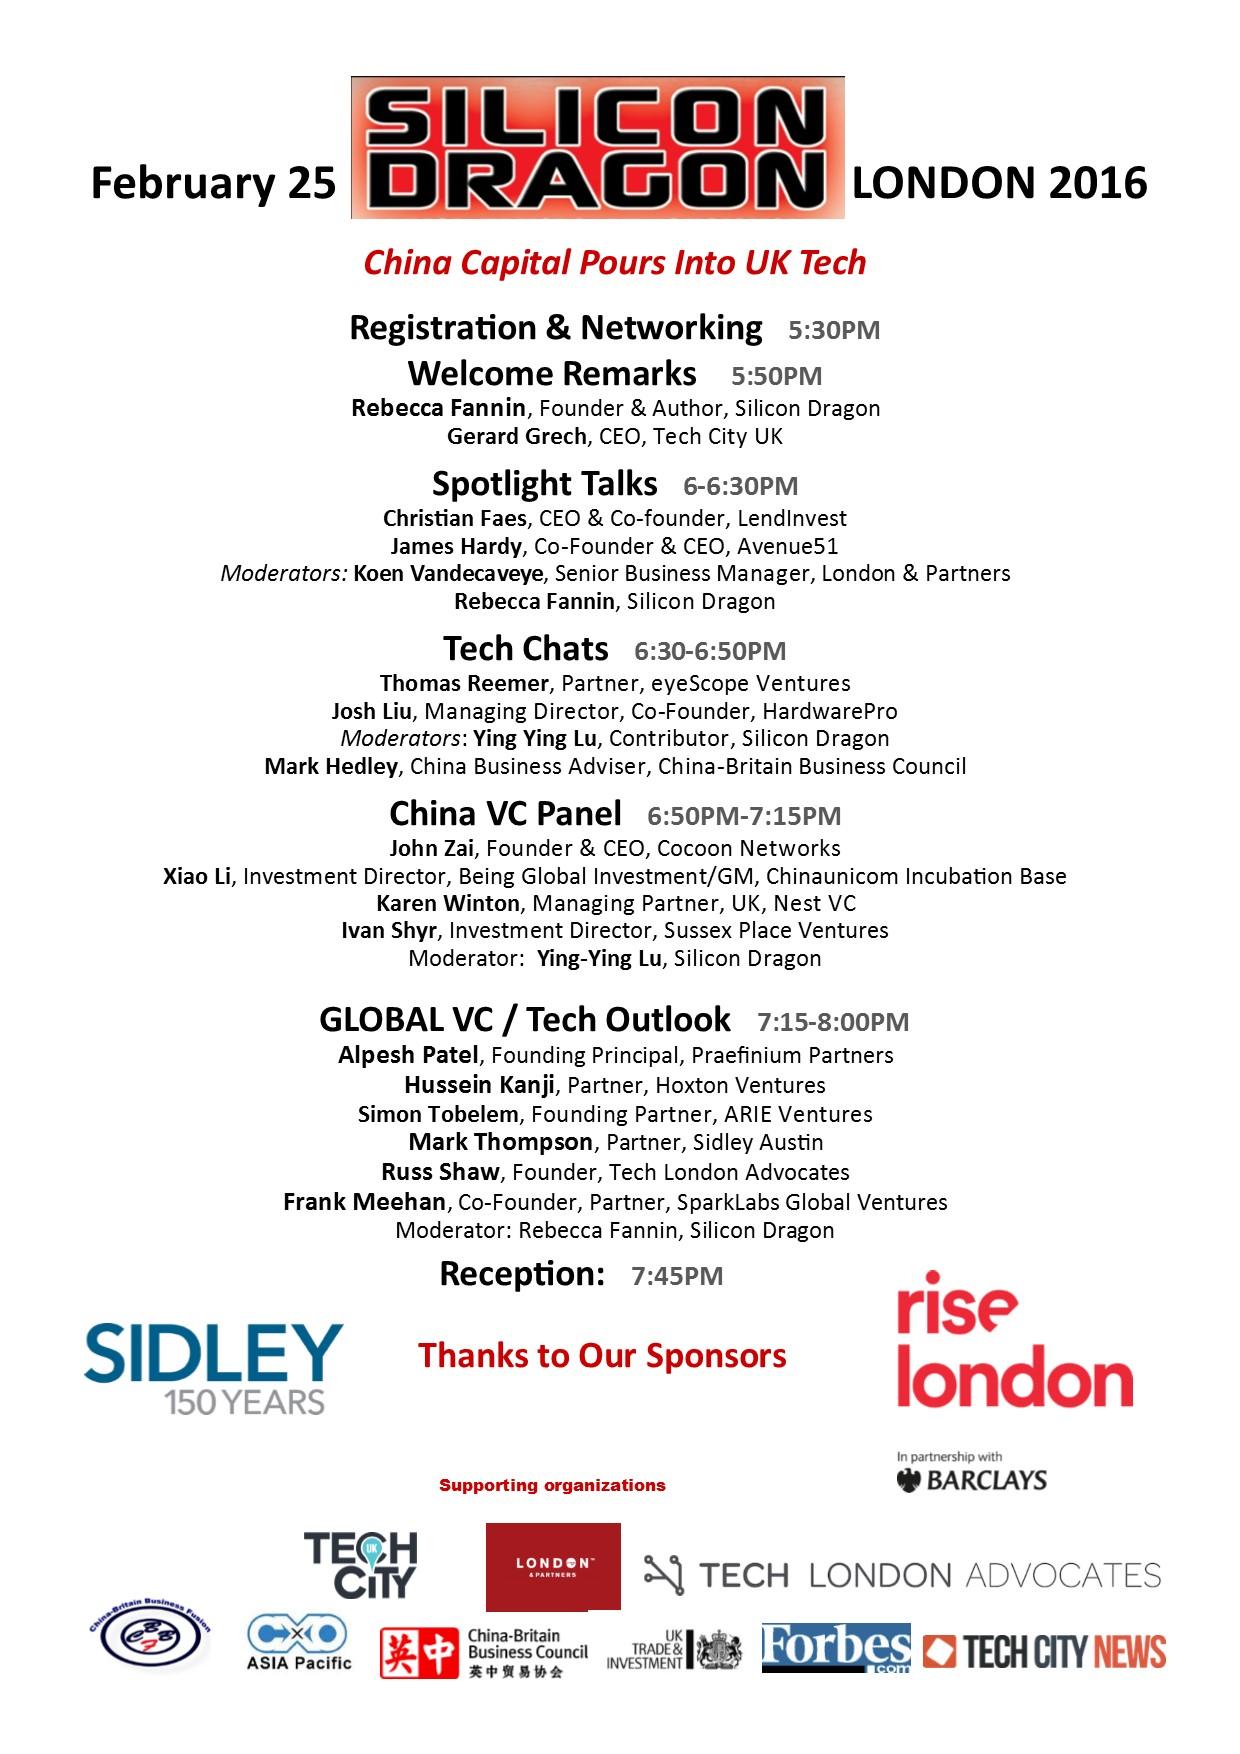 Silicon Dragon London 2016